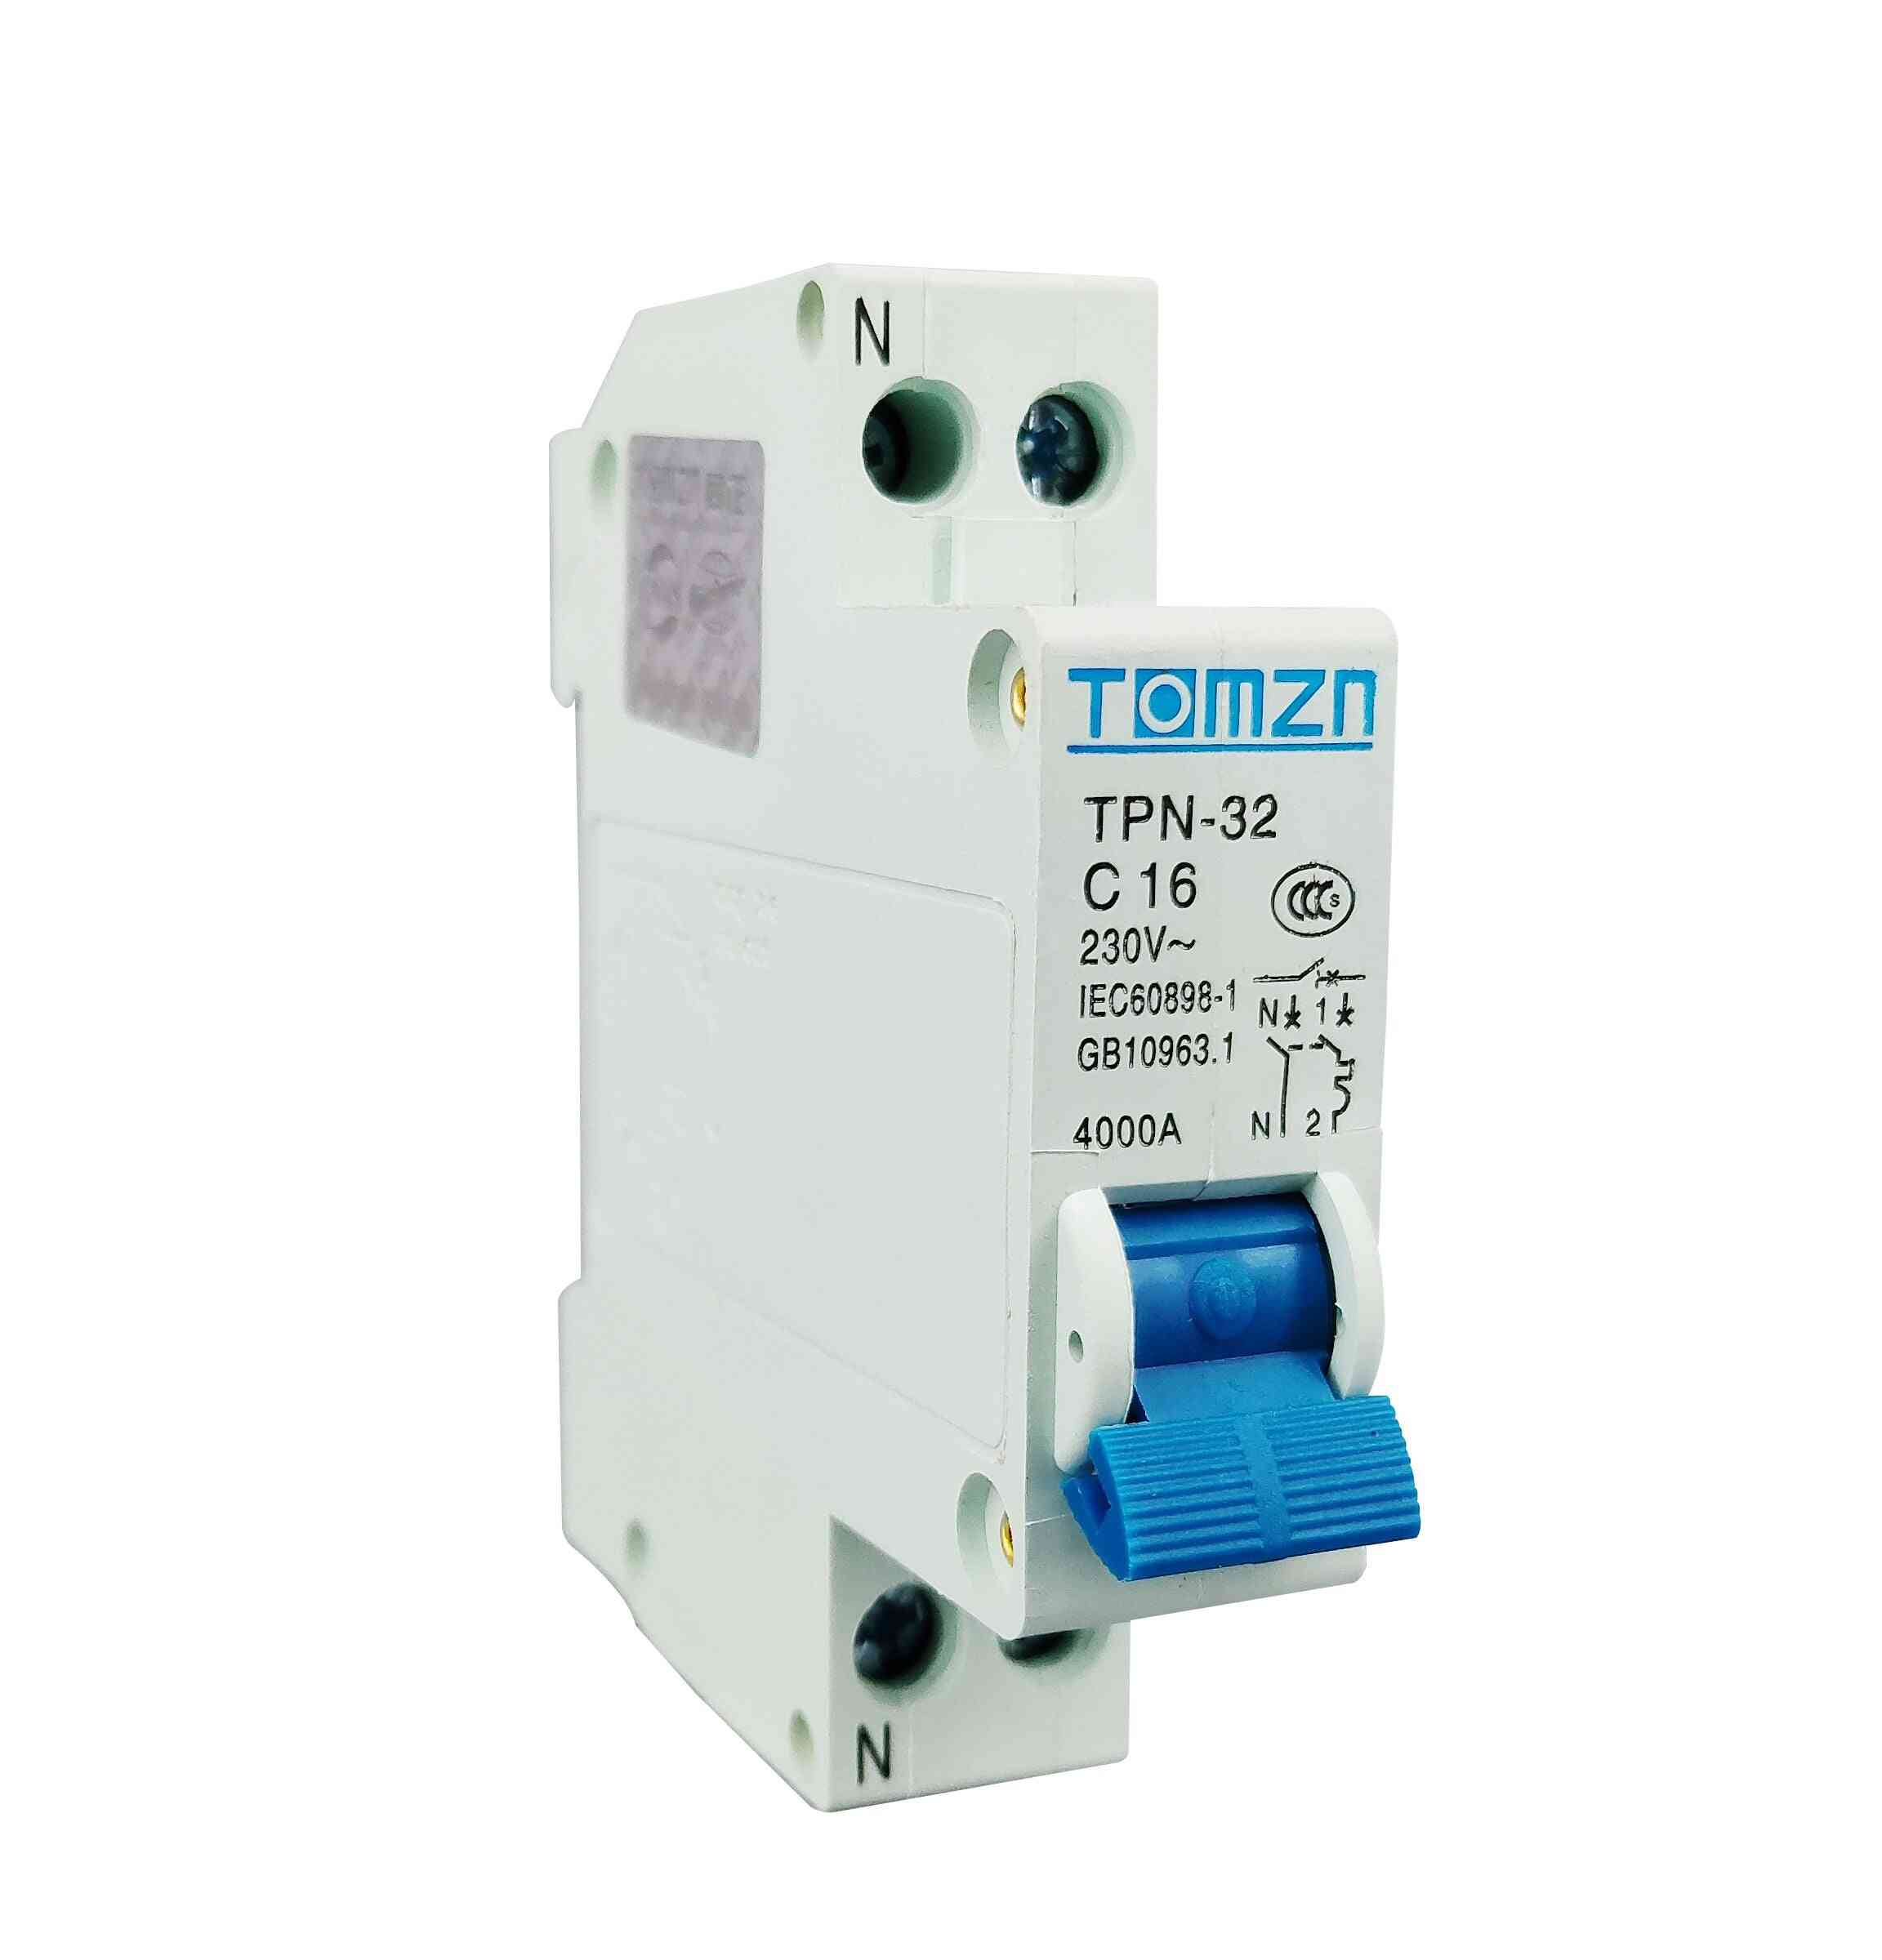 Mini Circuit Breaker Mcb 10a,16a,20a,25a,32a